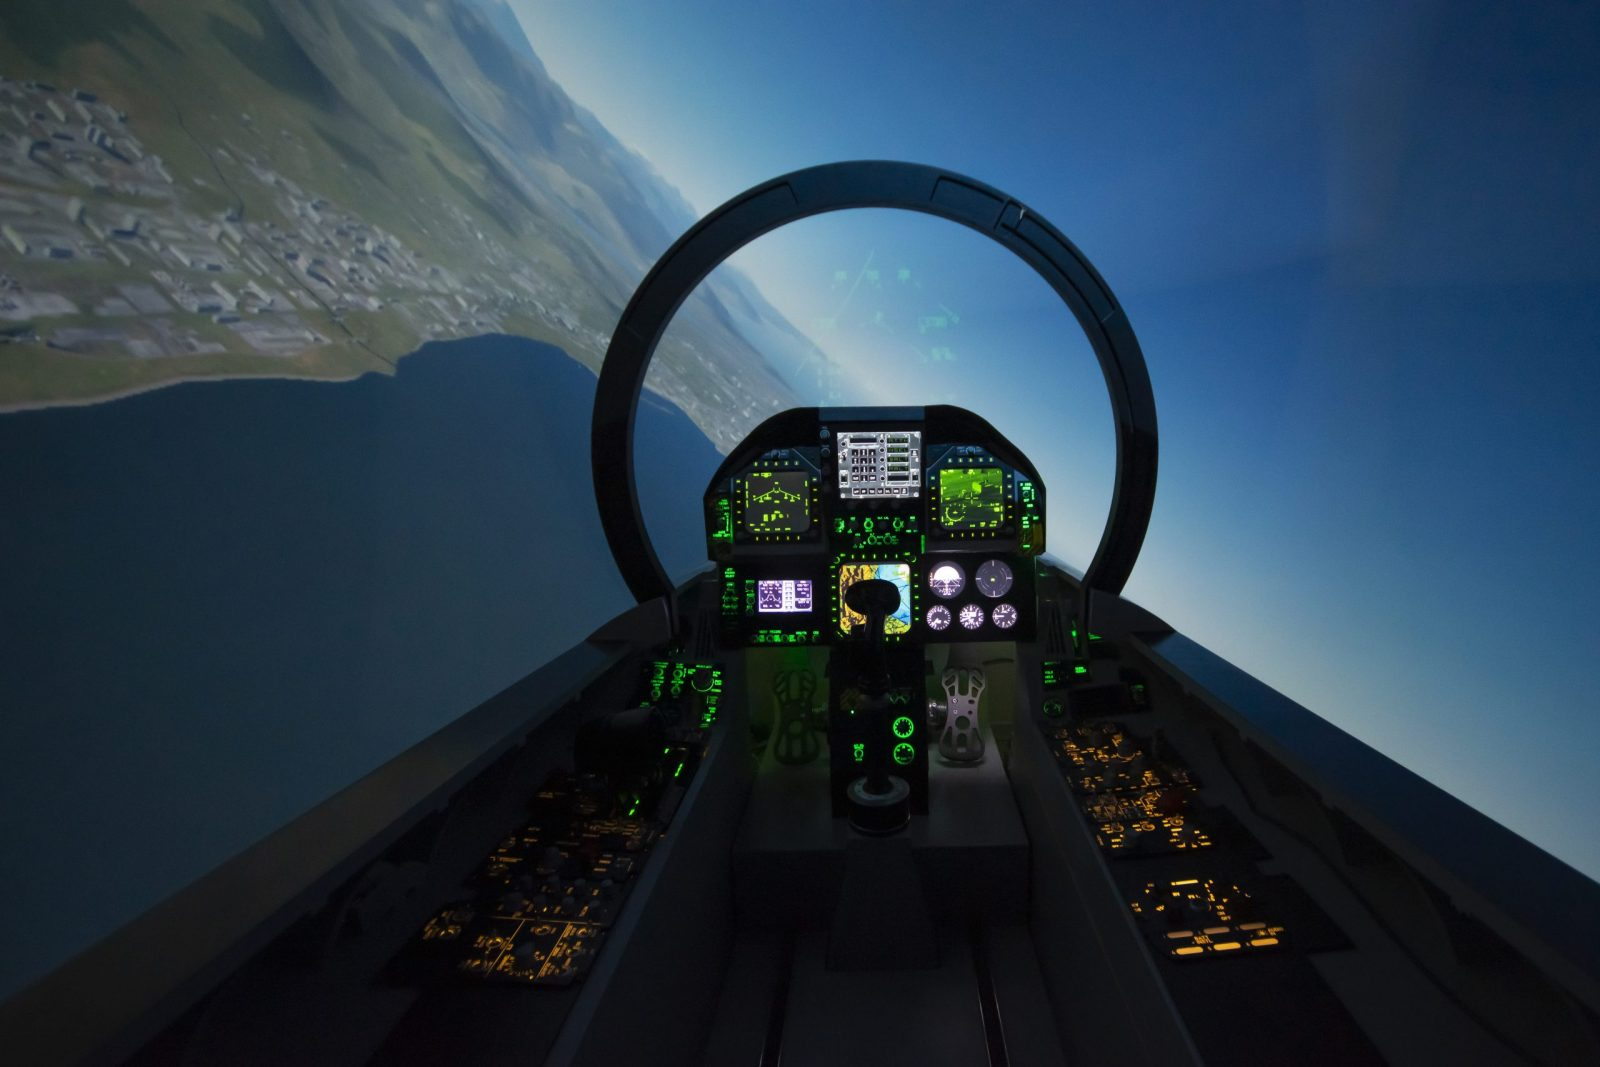 F-18 fighter jet aircraft simulator